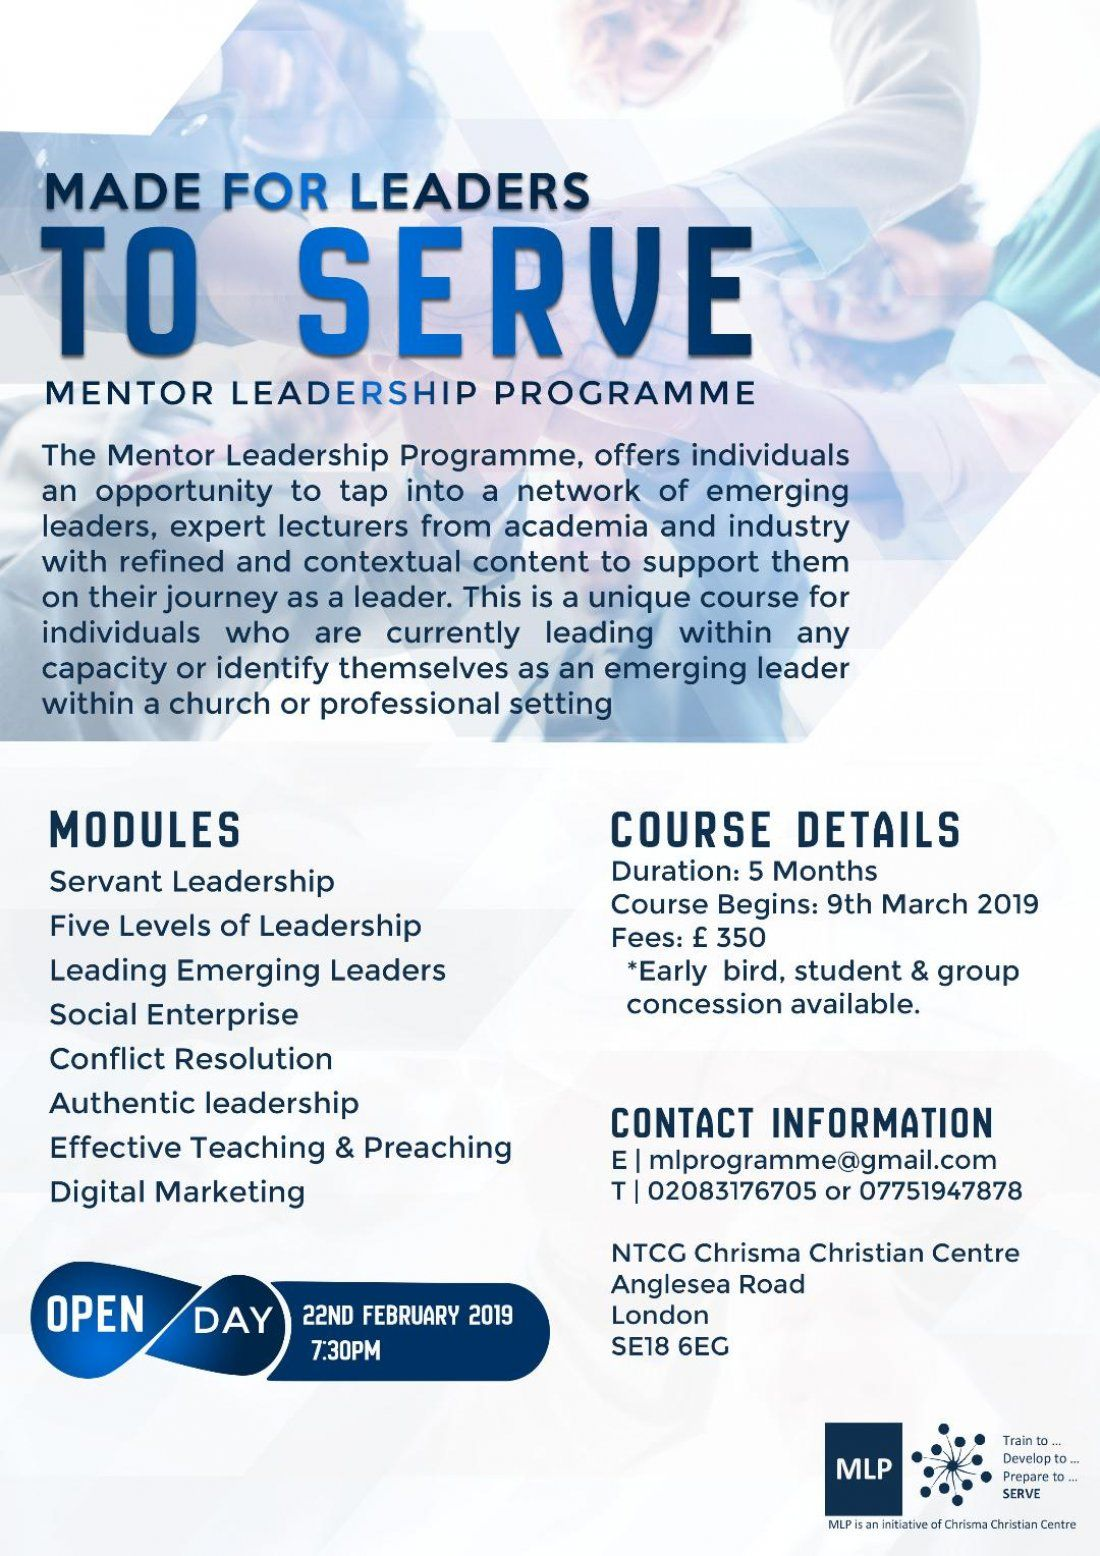 Mentor Leadership Programme